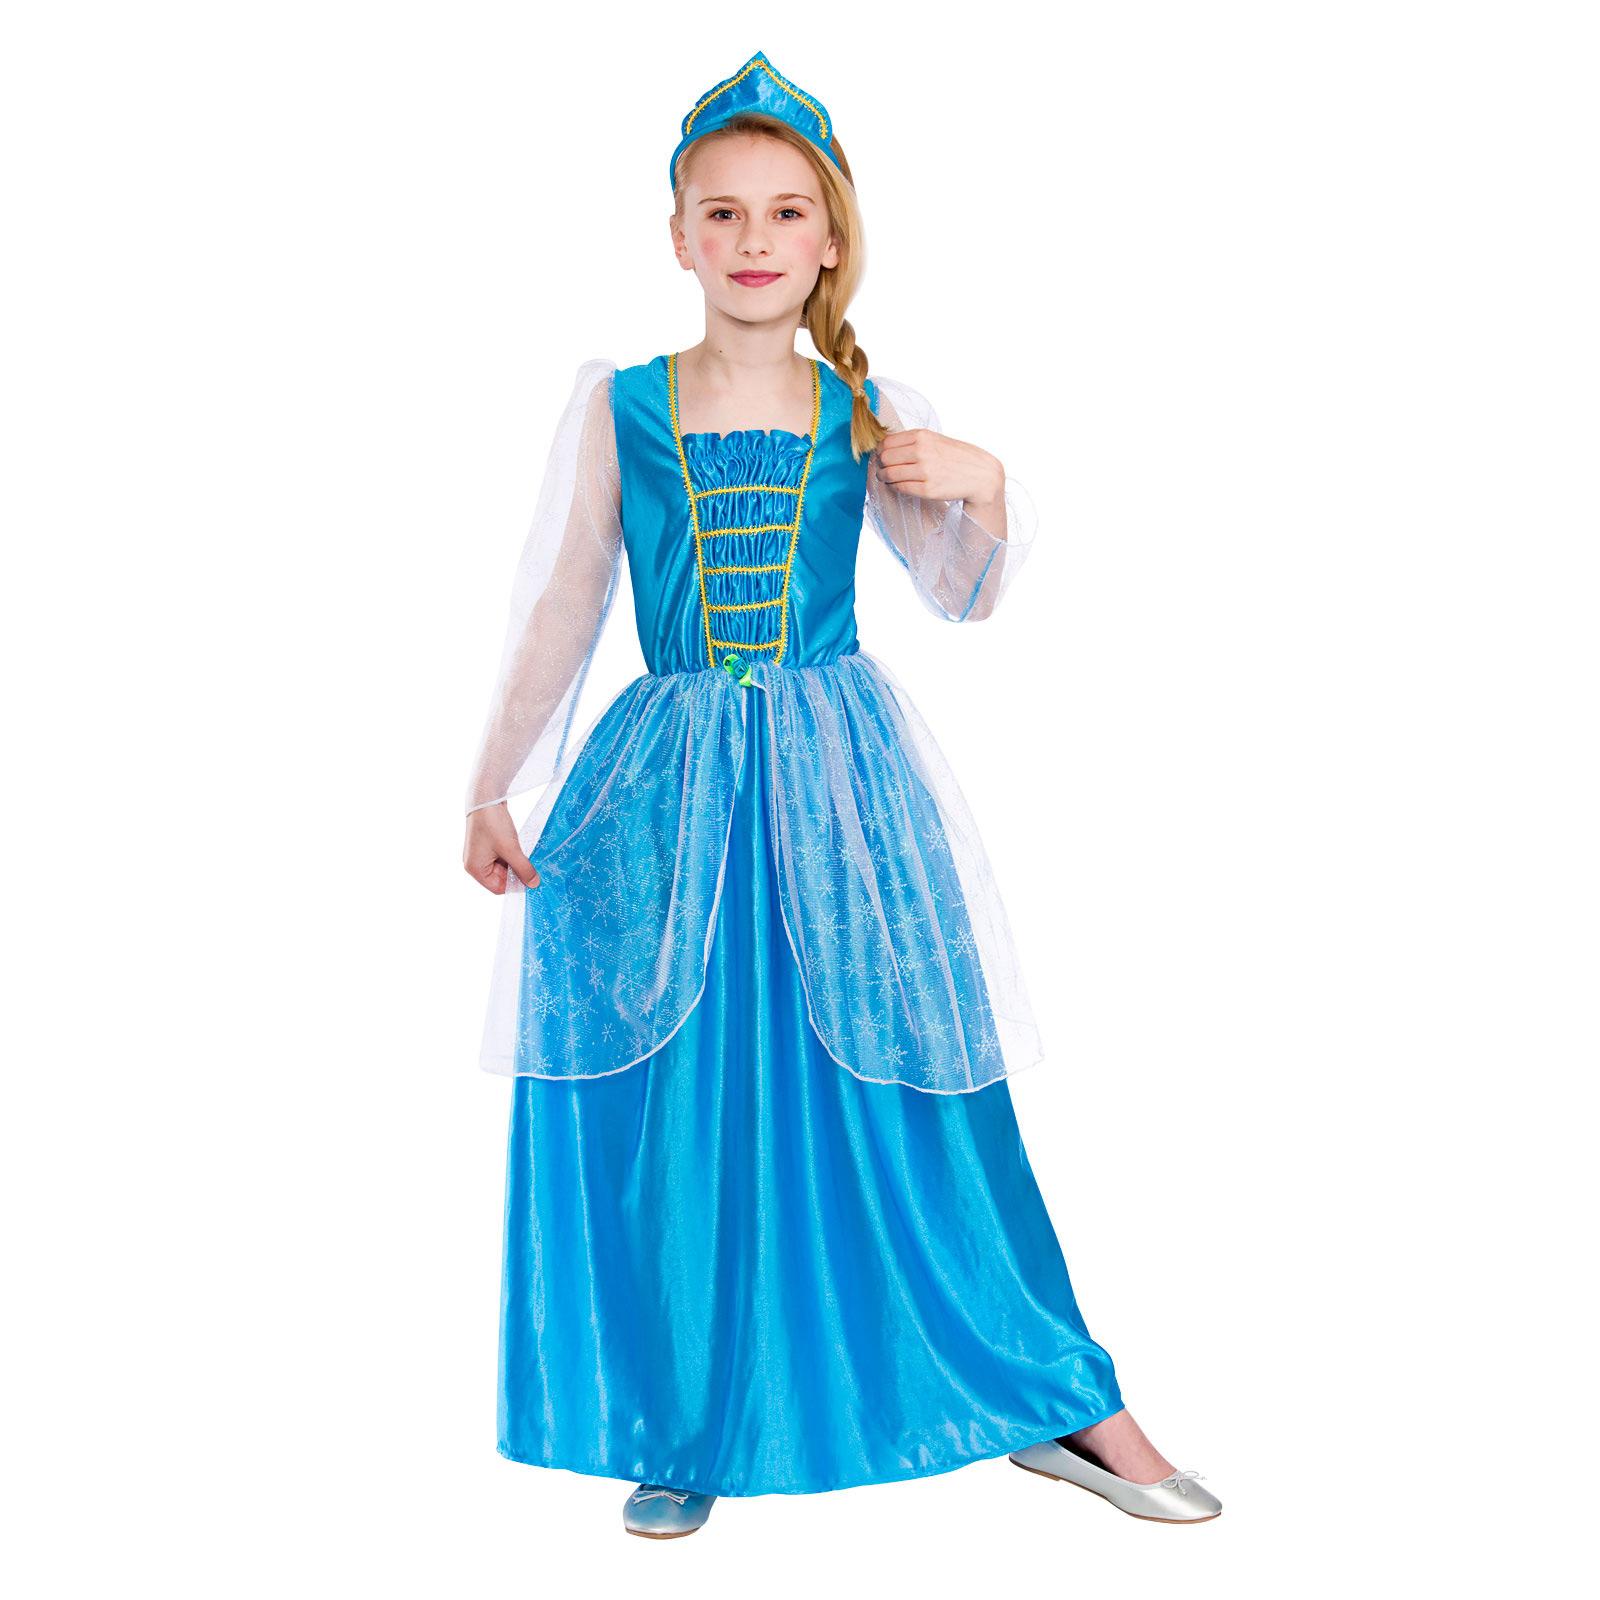 Halloween Girls Princess Fancy Dress Up Costume Outfits: Girls Ice Blue Princess Fancy Dress Up Party Costume